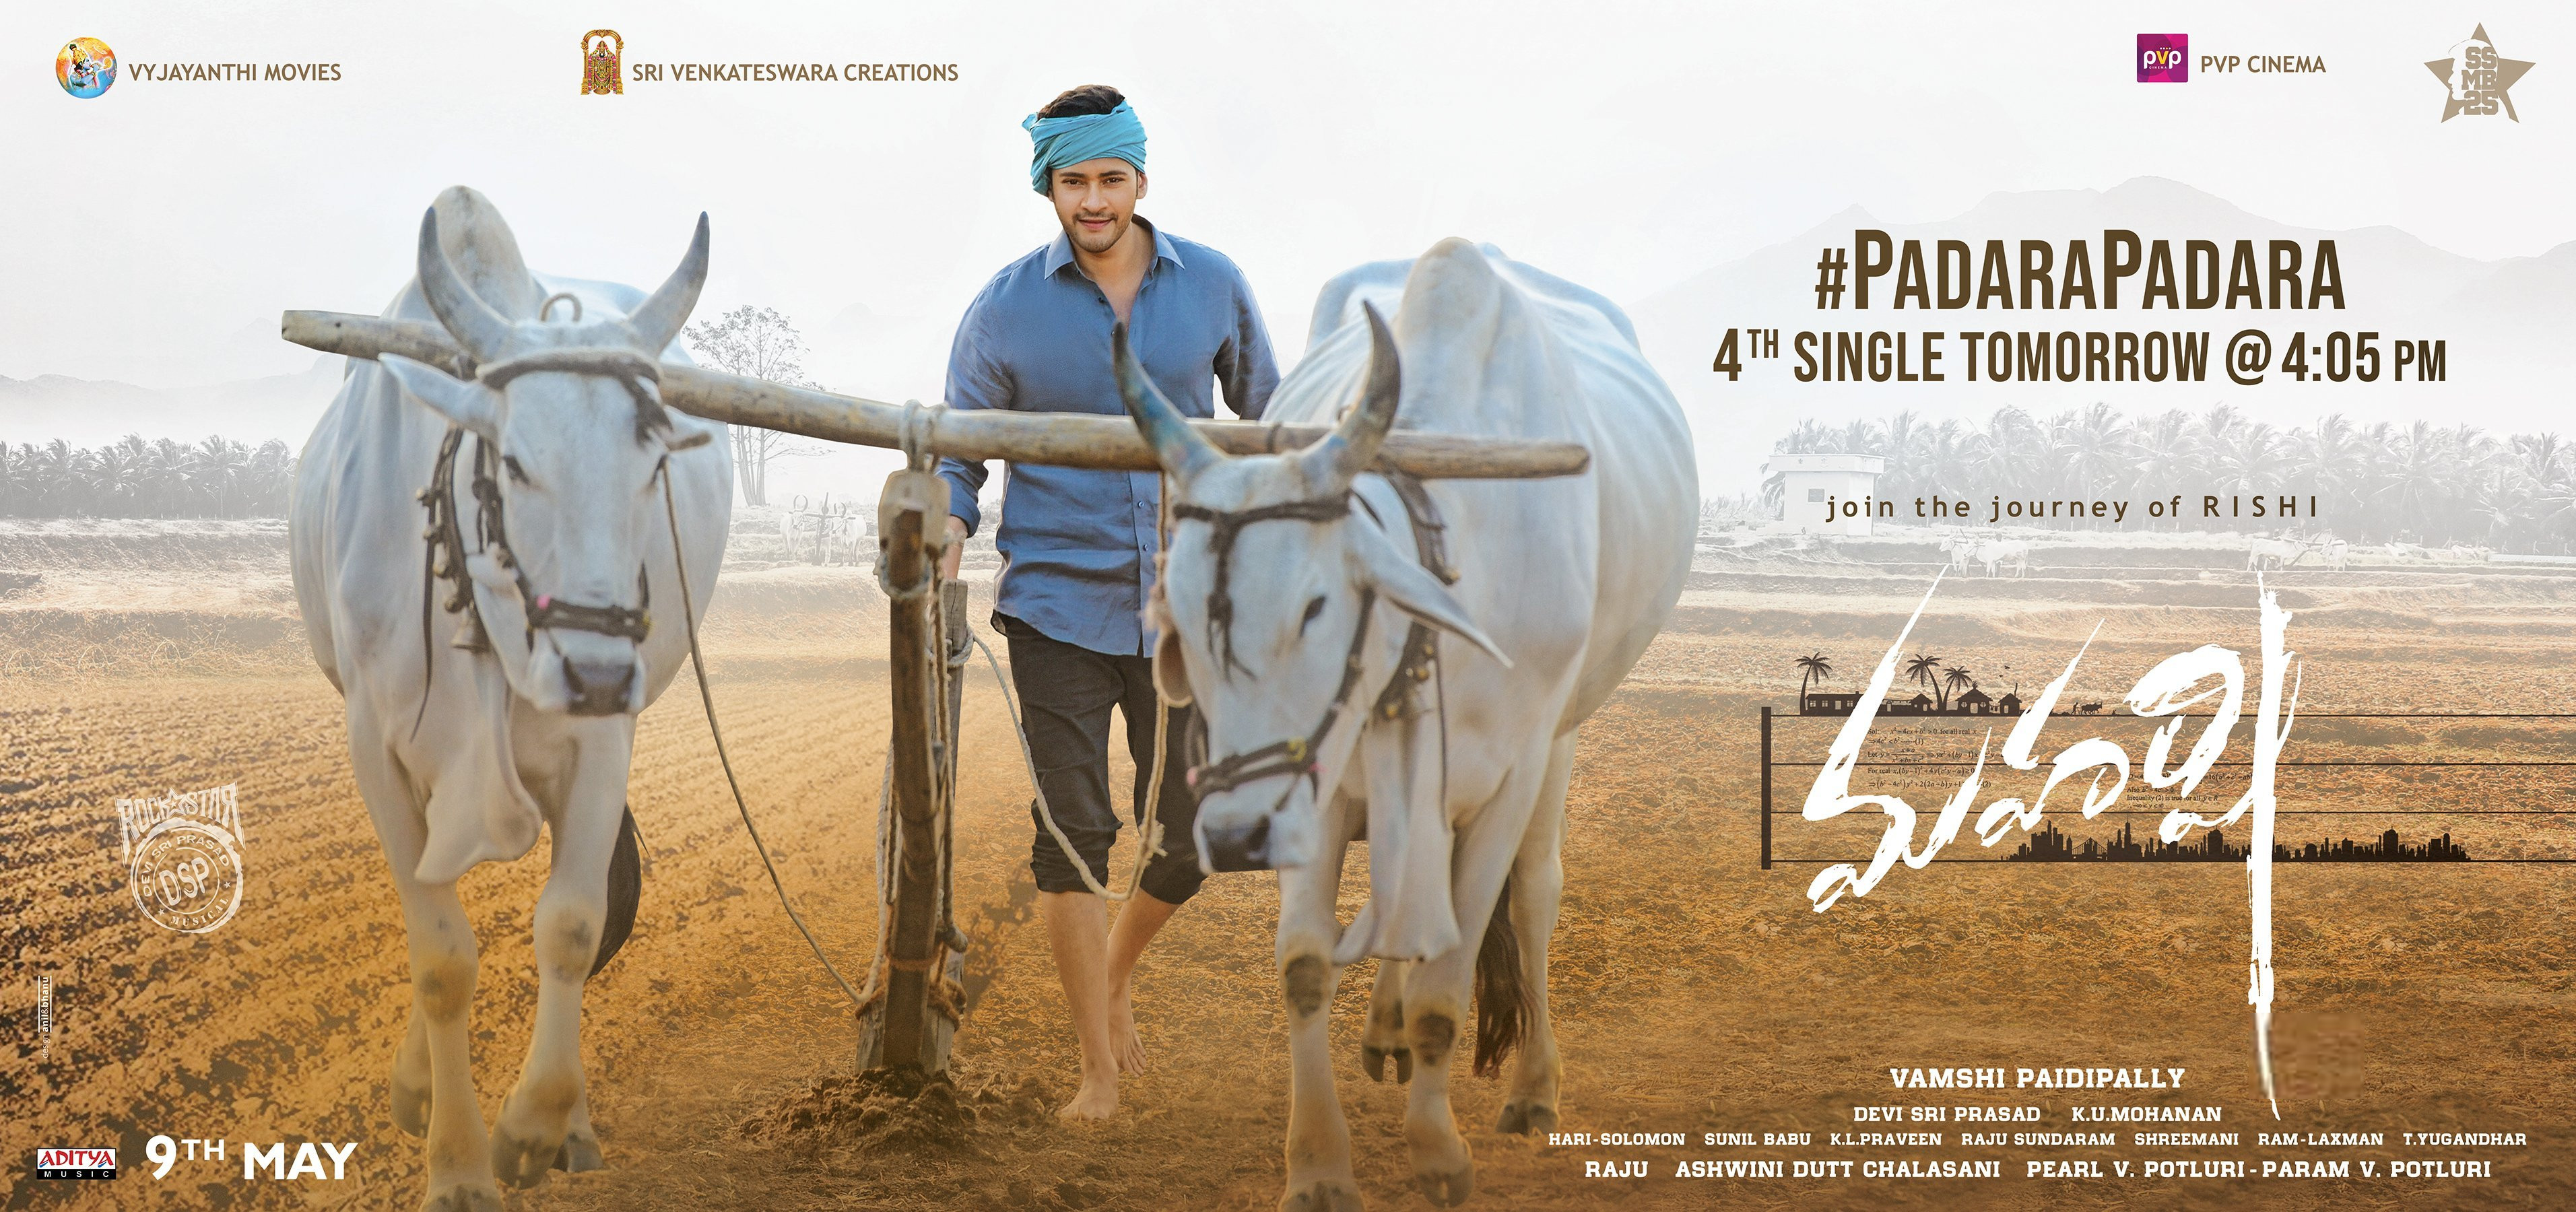 Mahesh Babu Maharshi Movie 4th Single Padara Padara Song Release Tomorrow Poster HD